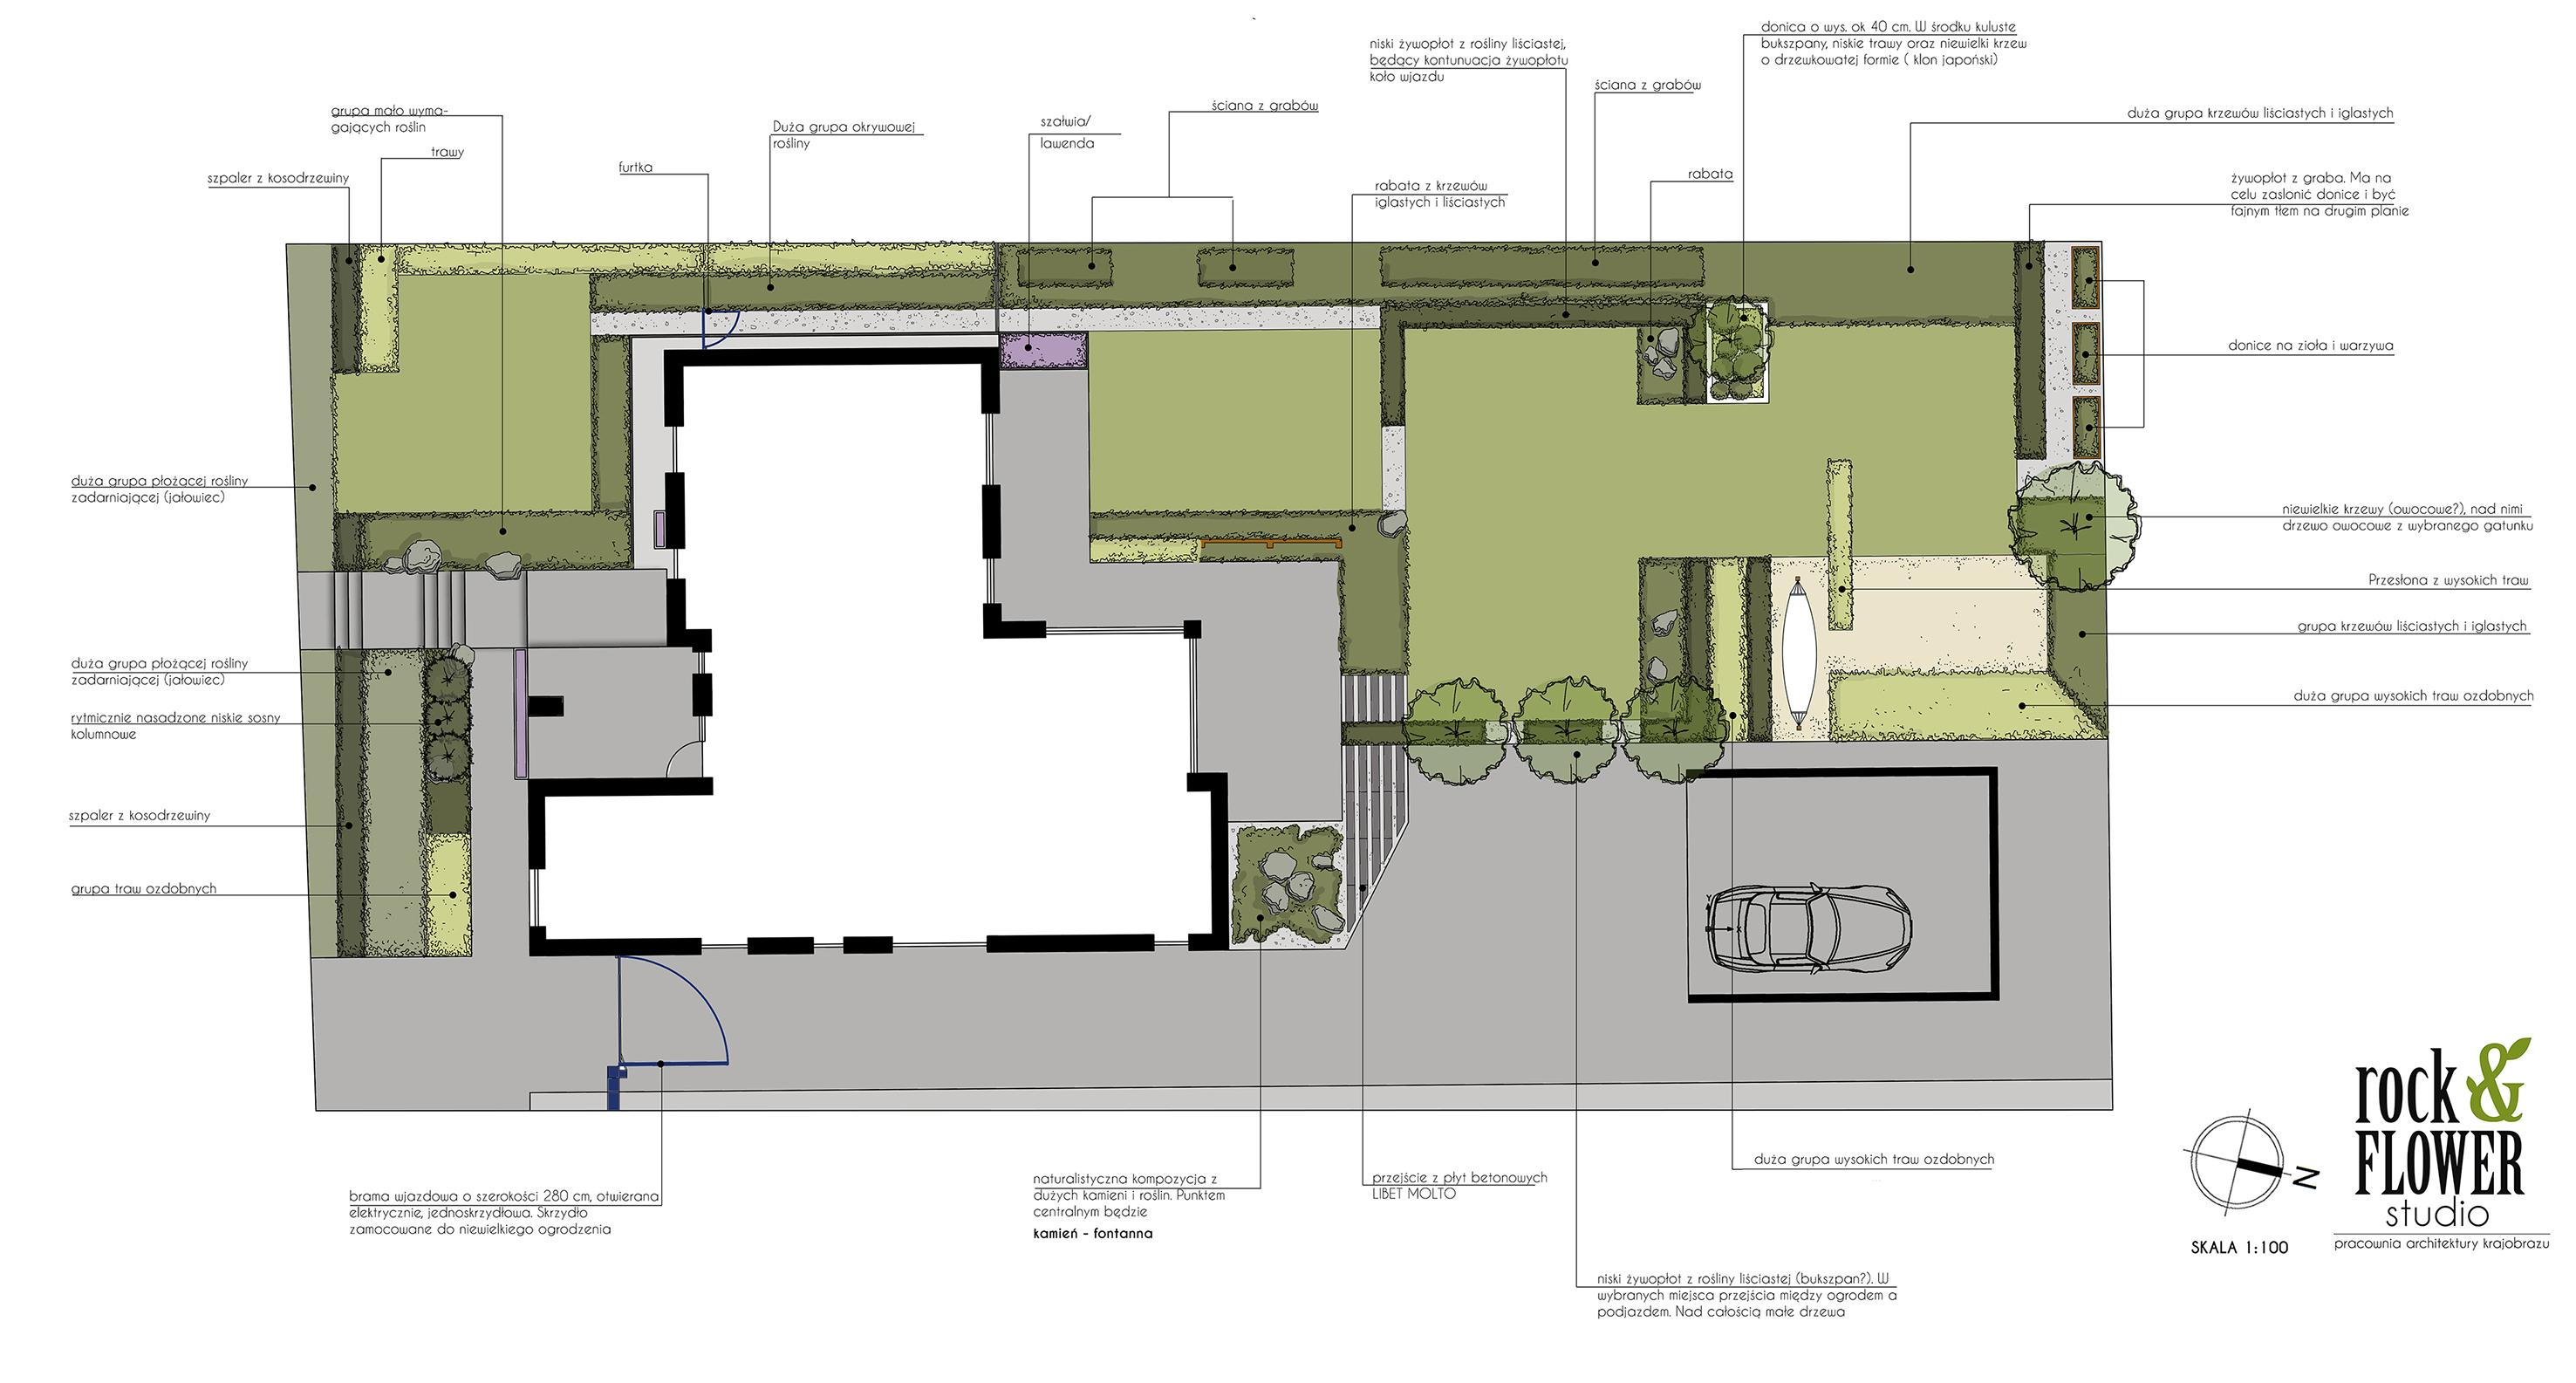 projekt-zahrady-navhr-rock-and-flower-studio-praha